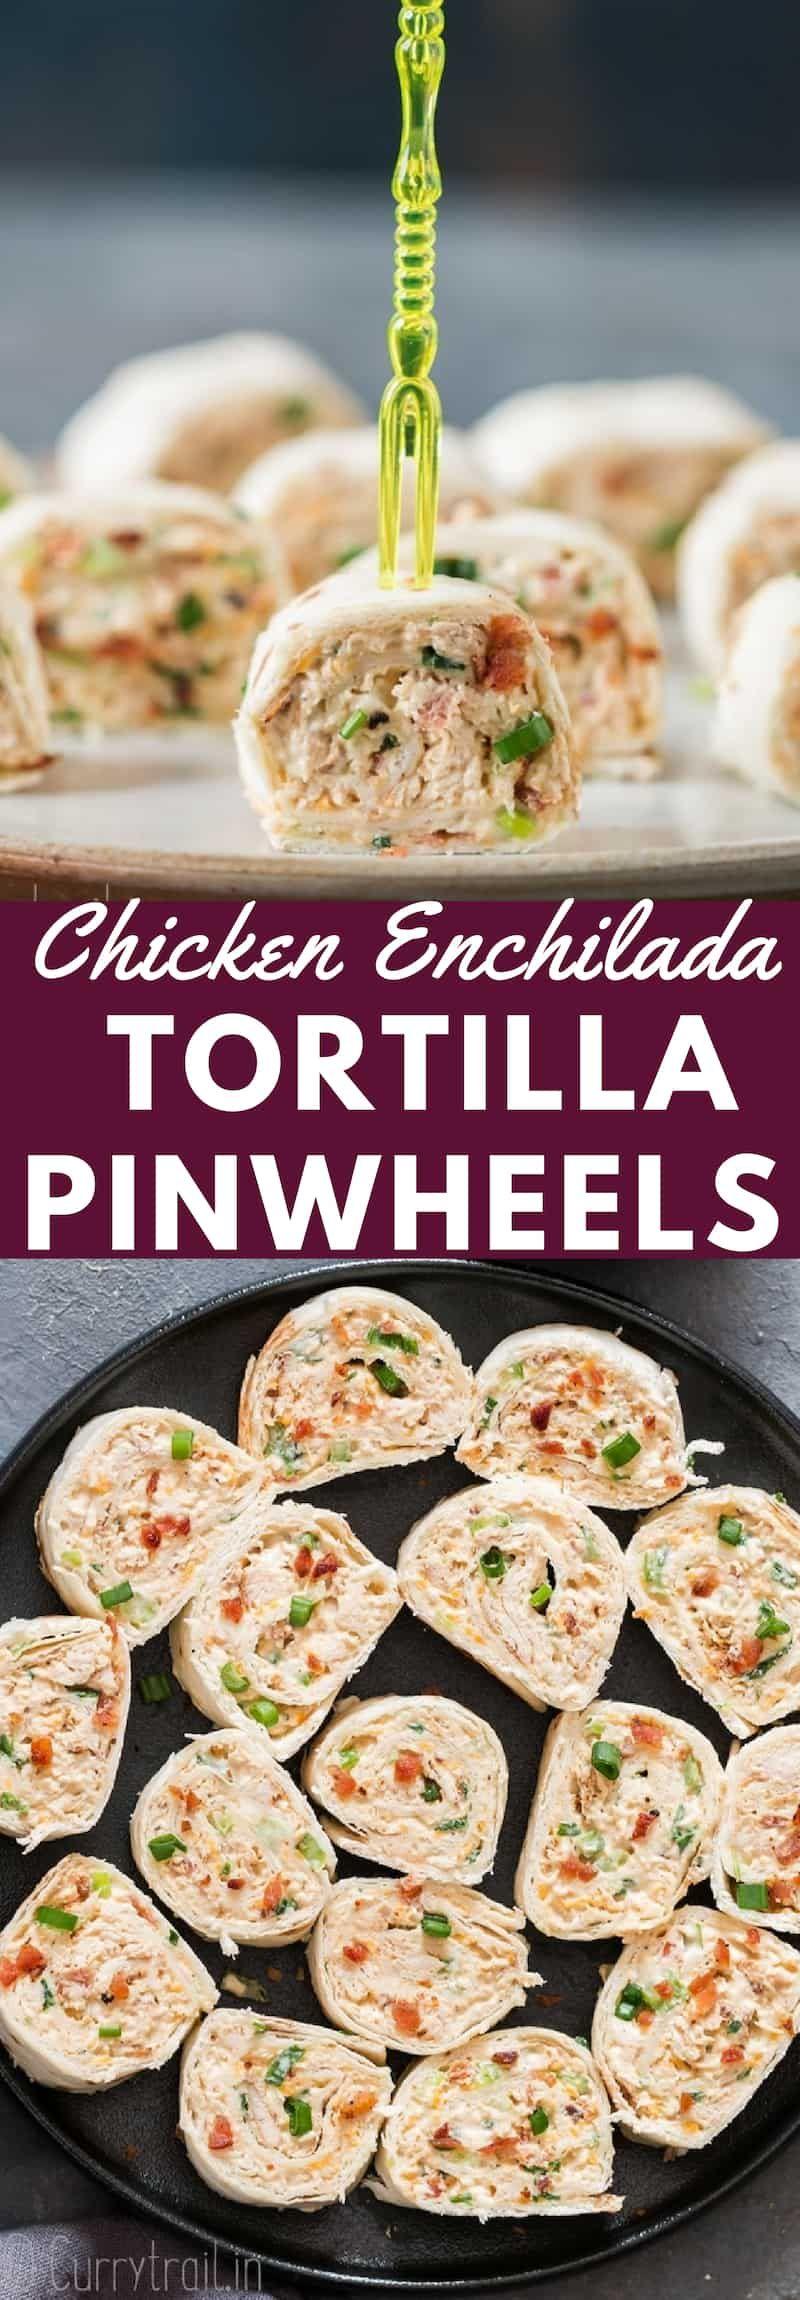 Photo of Chicken Enchilada Tortilla Roll-Ups (Tortilla Pinwheels) – CurryTrail